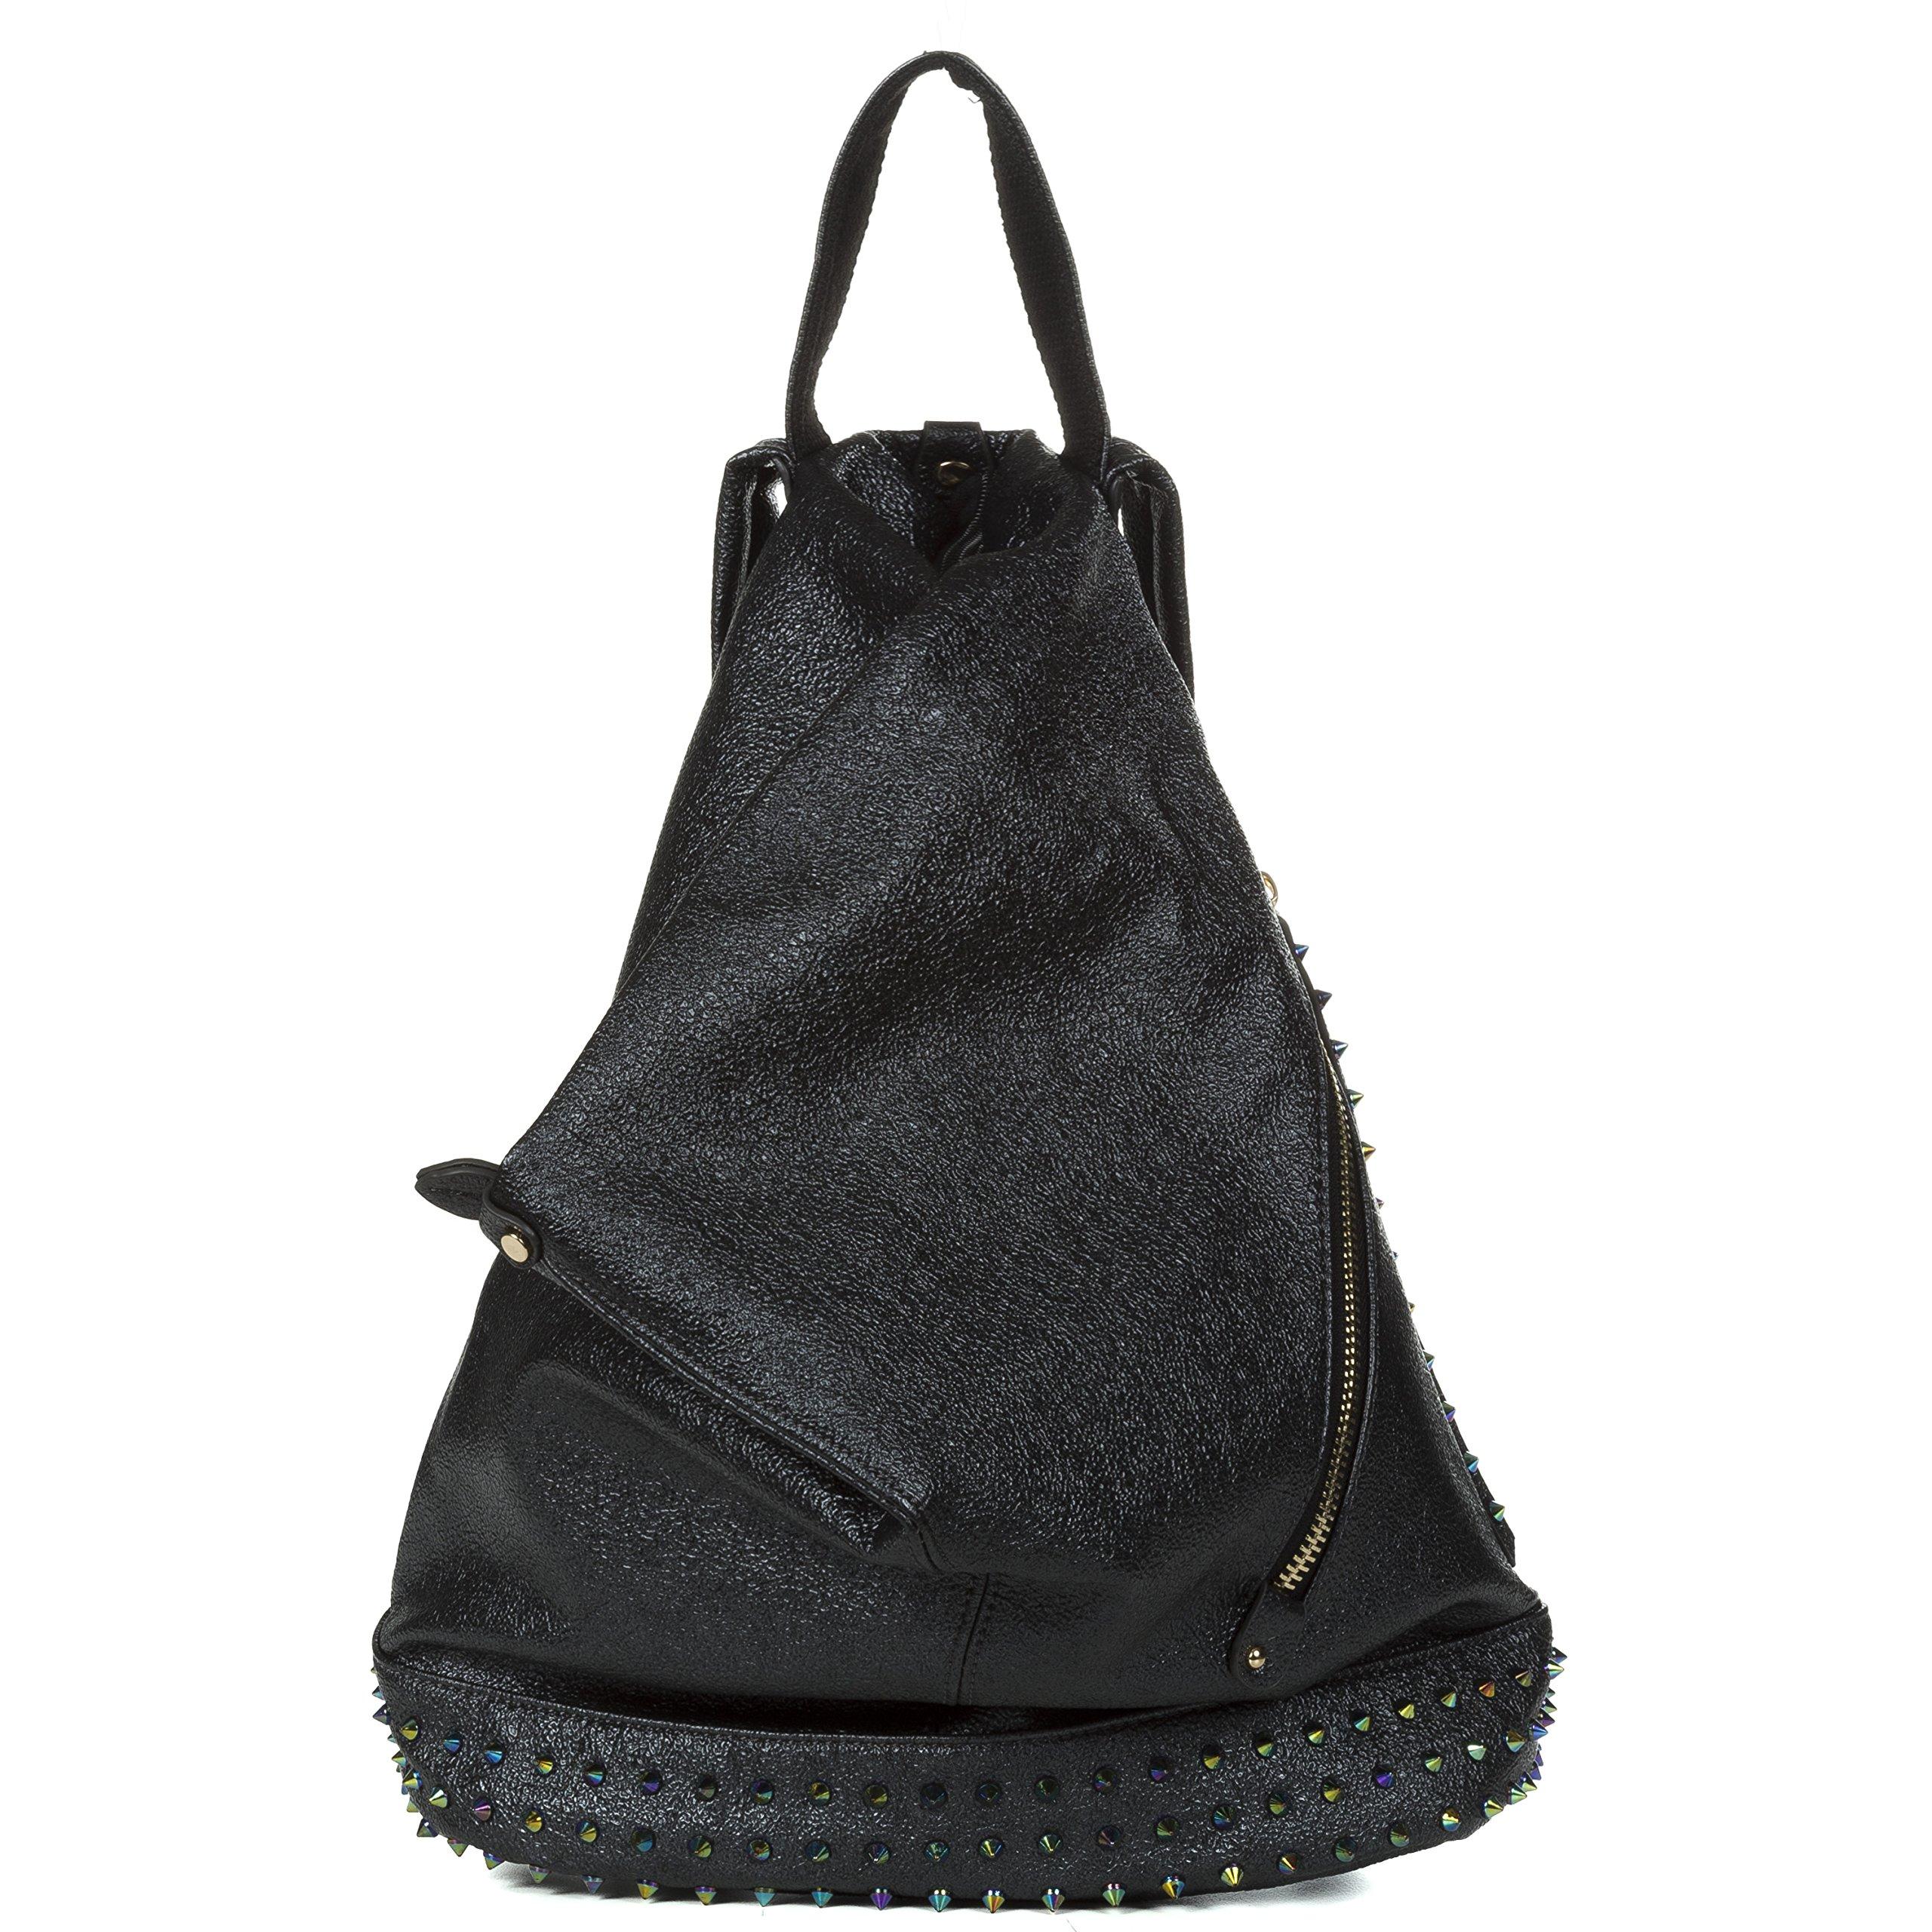 Handbag Republic Fashion Backpack Vegan Leather Travel Bag Easy Carry For Women by Handbag Republic (Image #1)